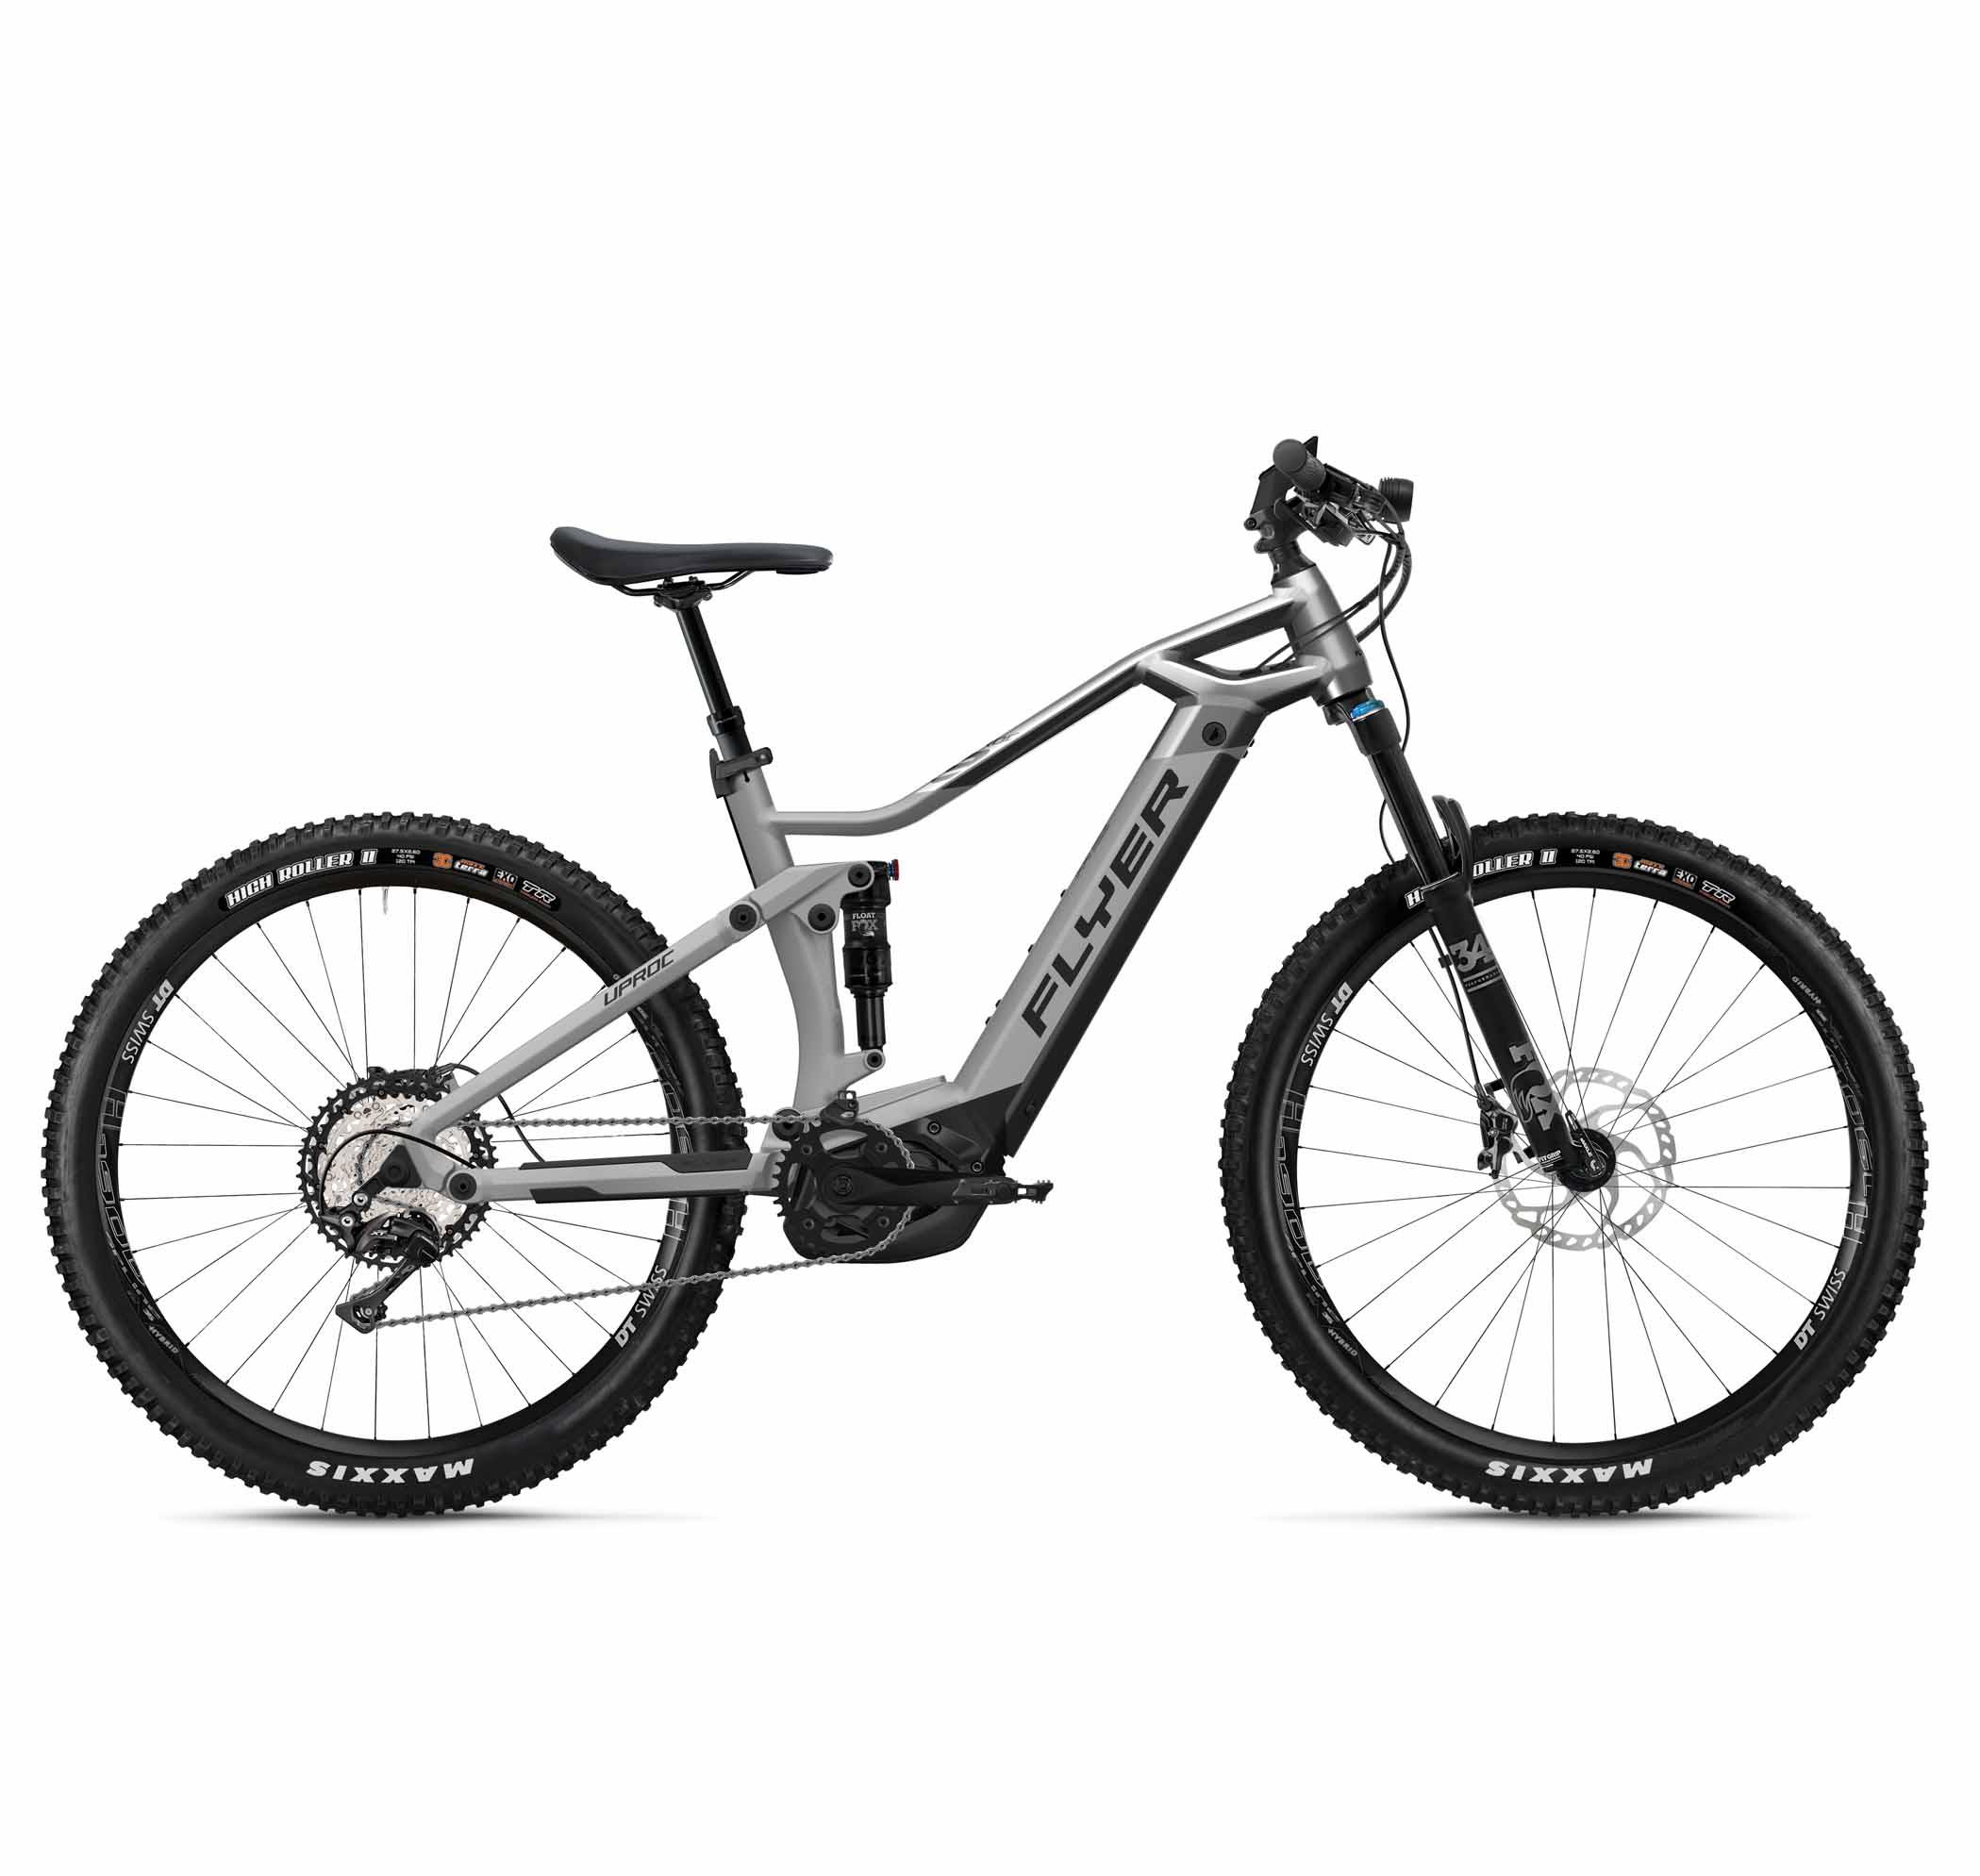 Flyer_Rodeo_Bike_Uproc_3_eBike_870_fullsuspension_SolidGreyCastSilverGloss